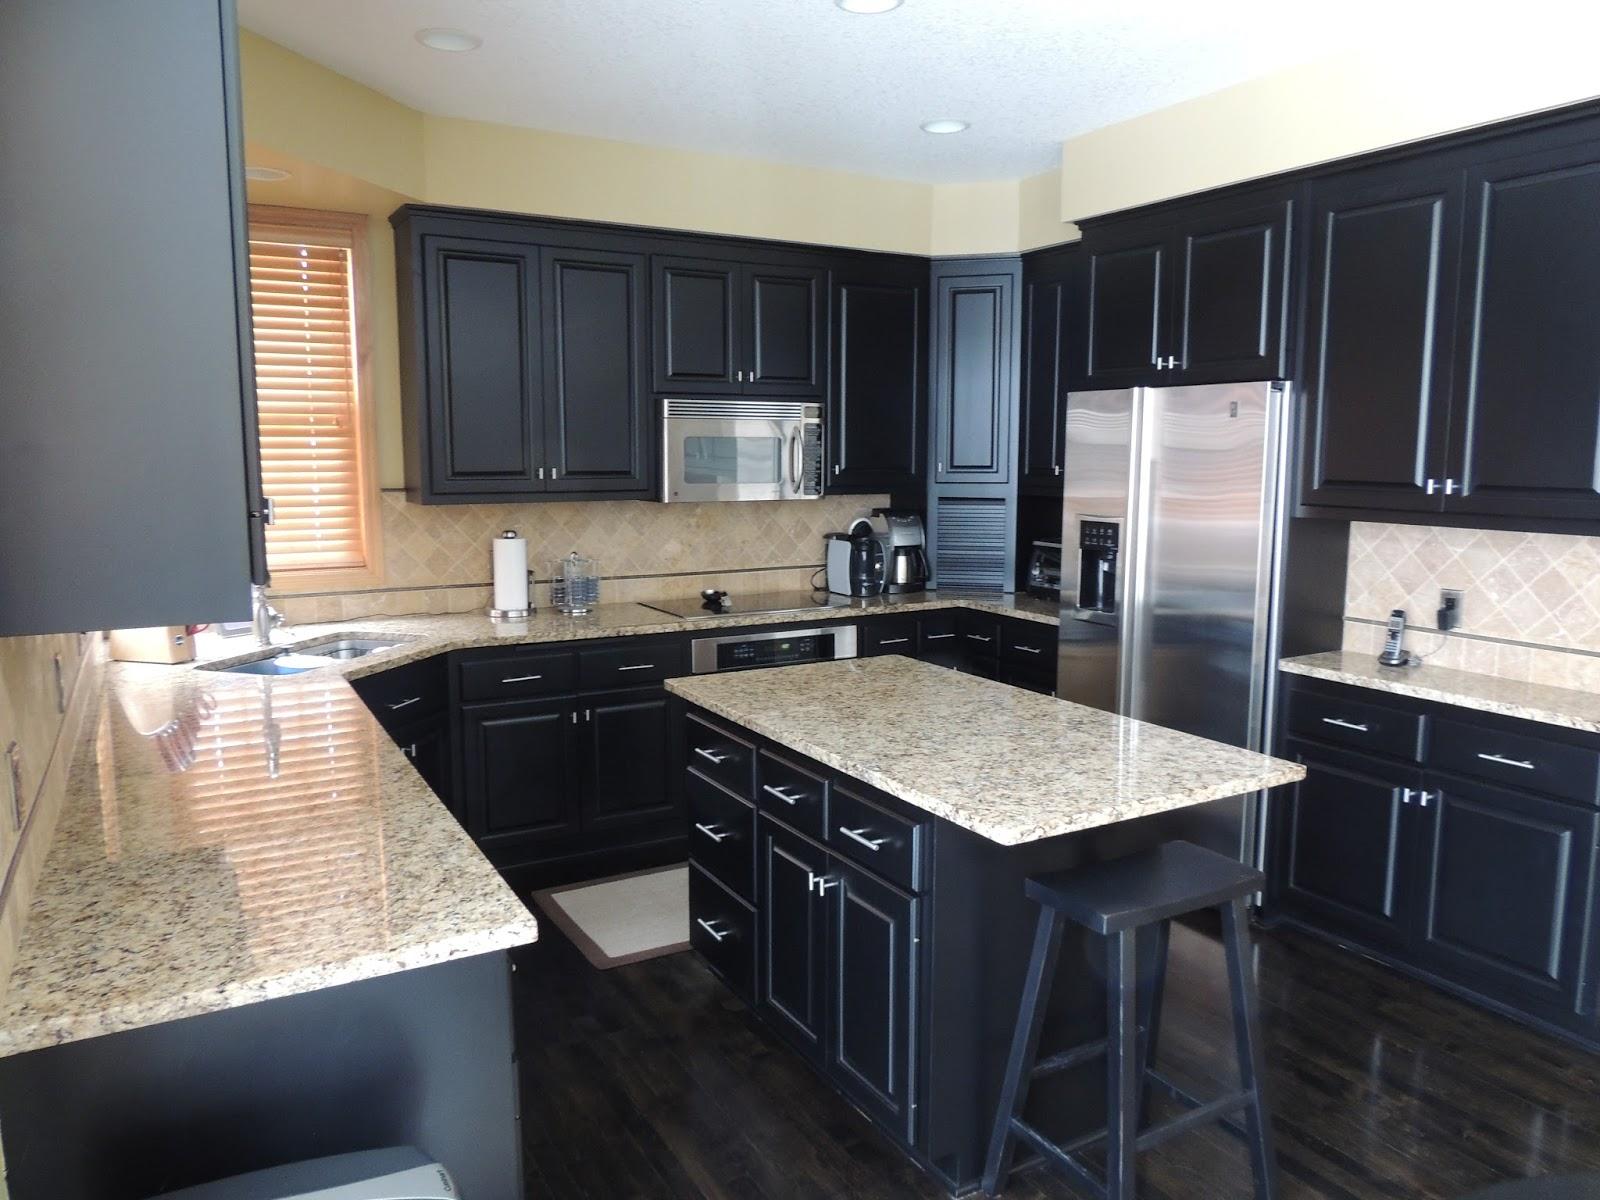 55 gambar meja dapur minimalis keramik granit kayu dll white kitchen cabinets cabinets com